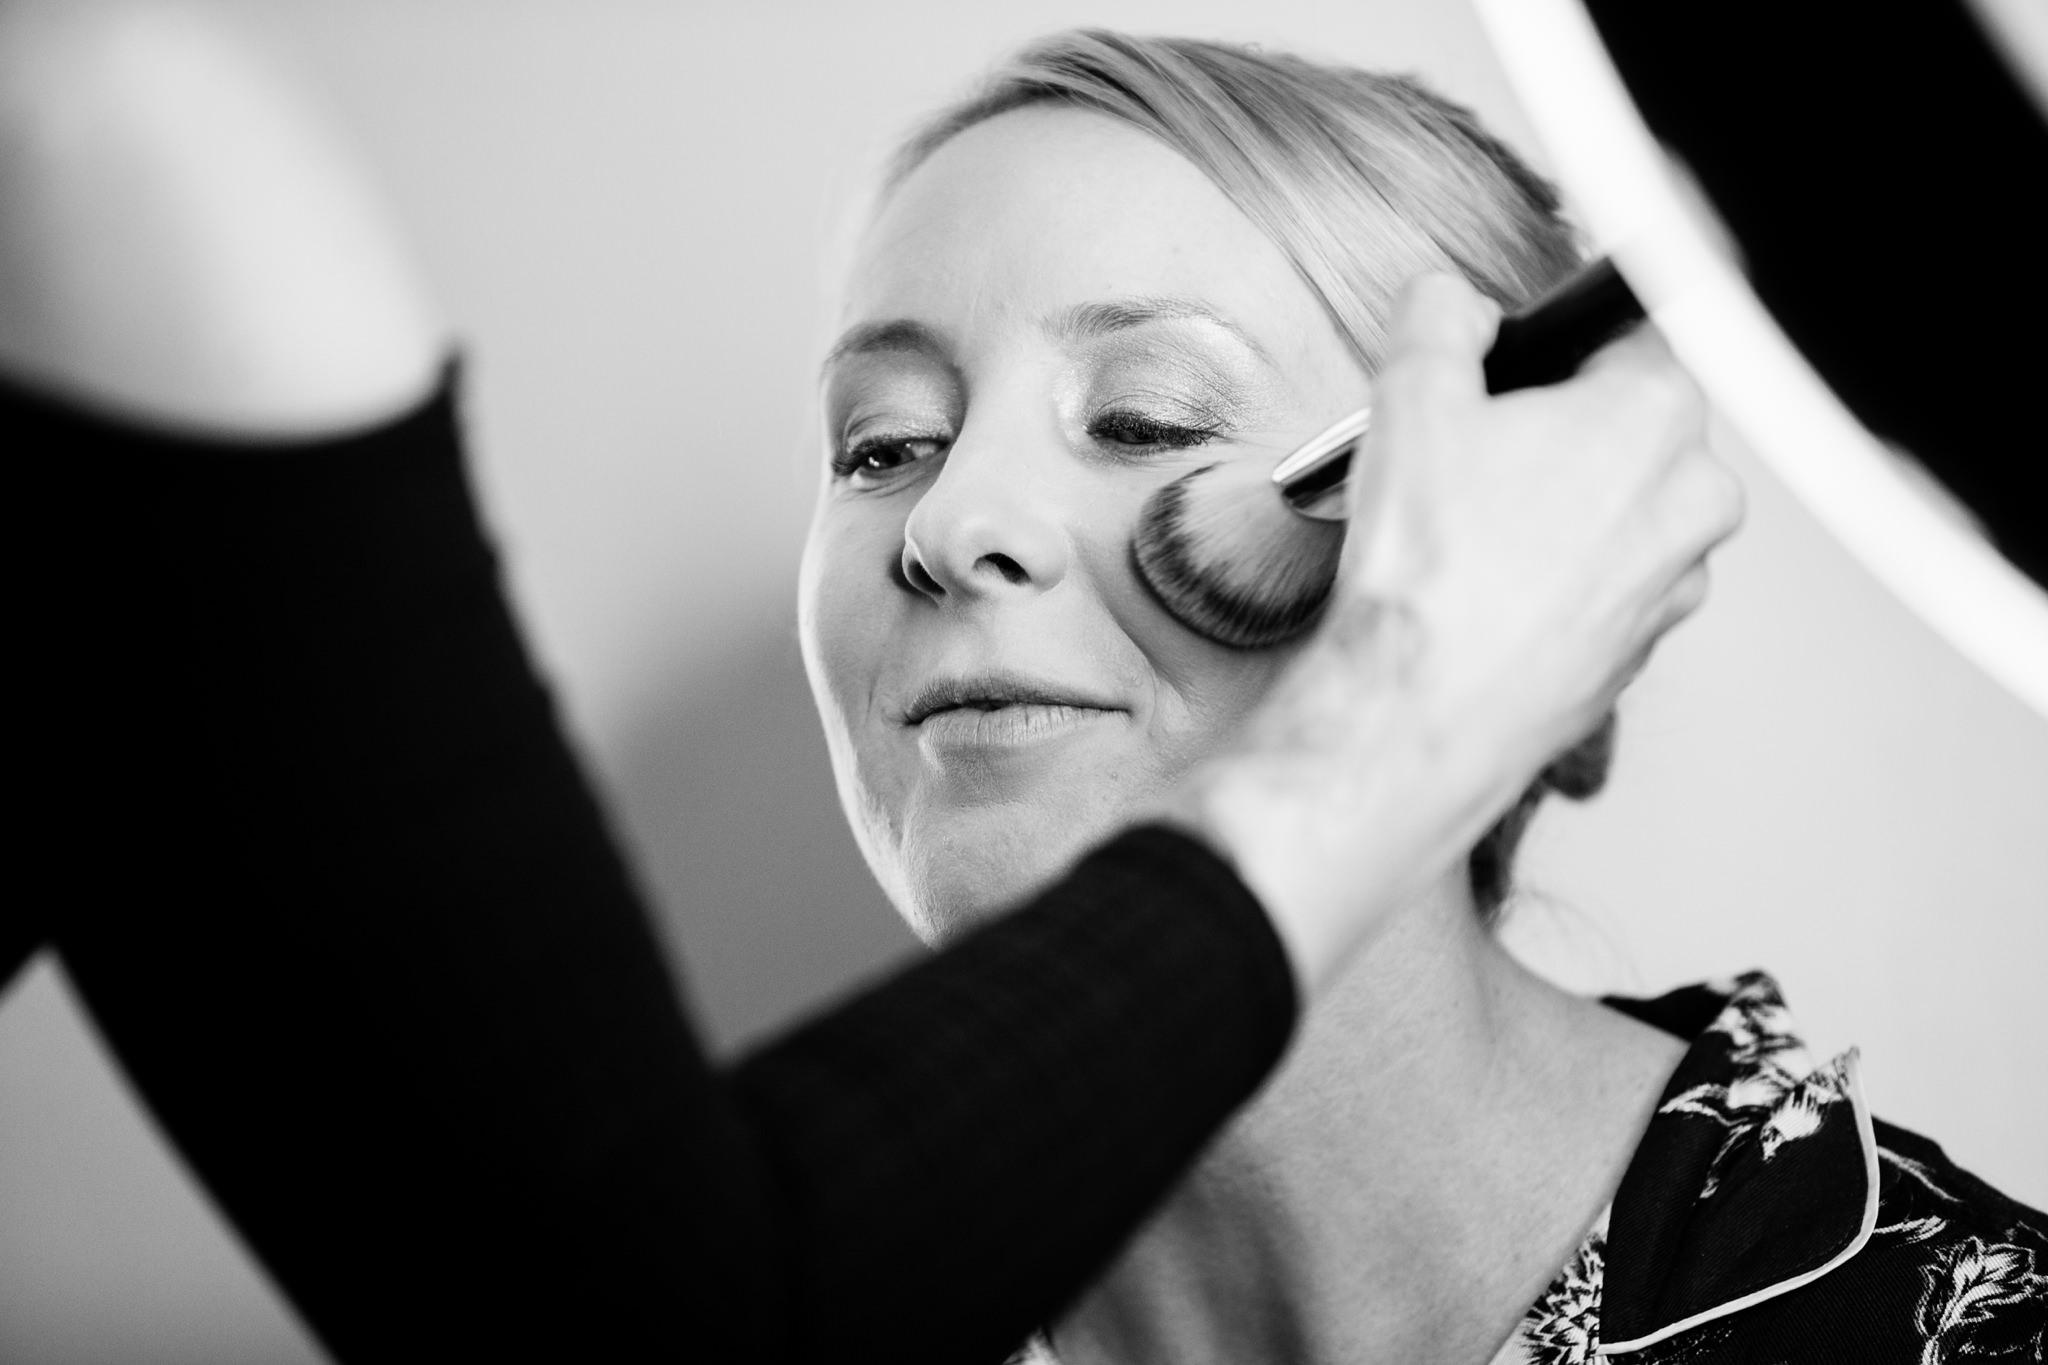 Elisha-Clarke-Photography-Dublin-City-Wedding_0035.jpg